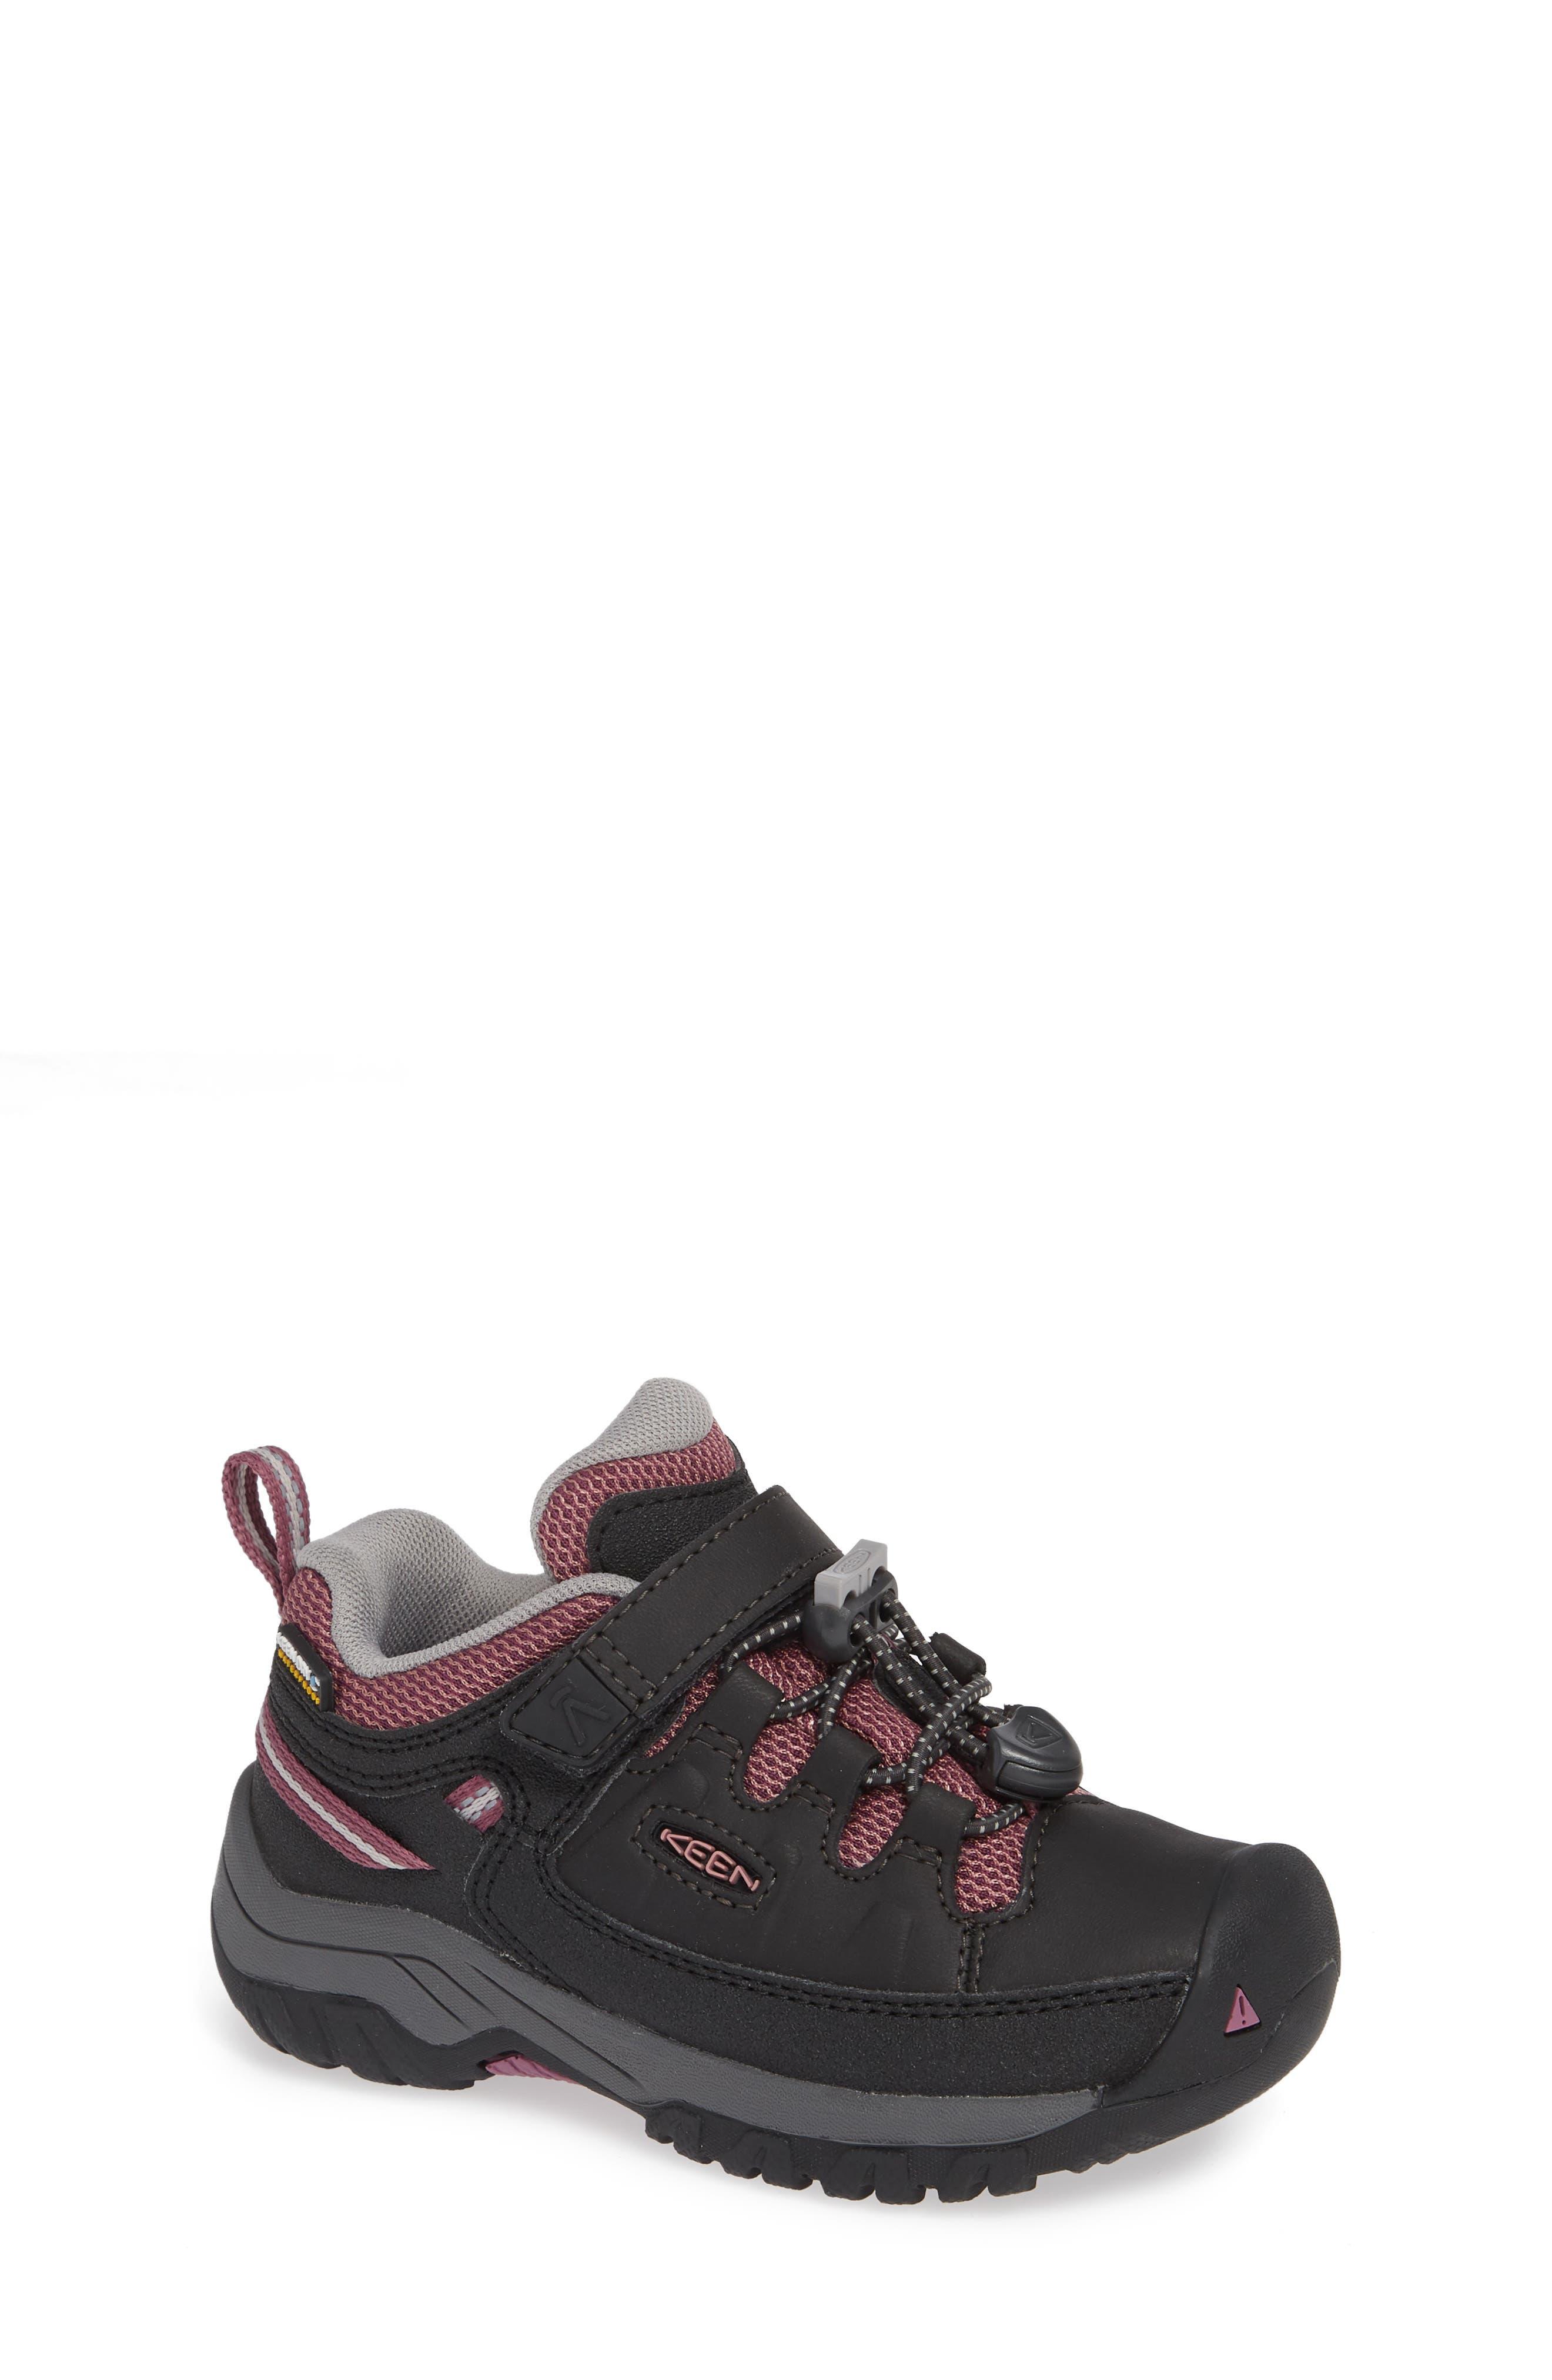 Targhee Low Waterproof Sneaker,                         Main,                         color, RAVEN/ TULIPWOOD